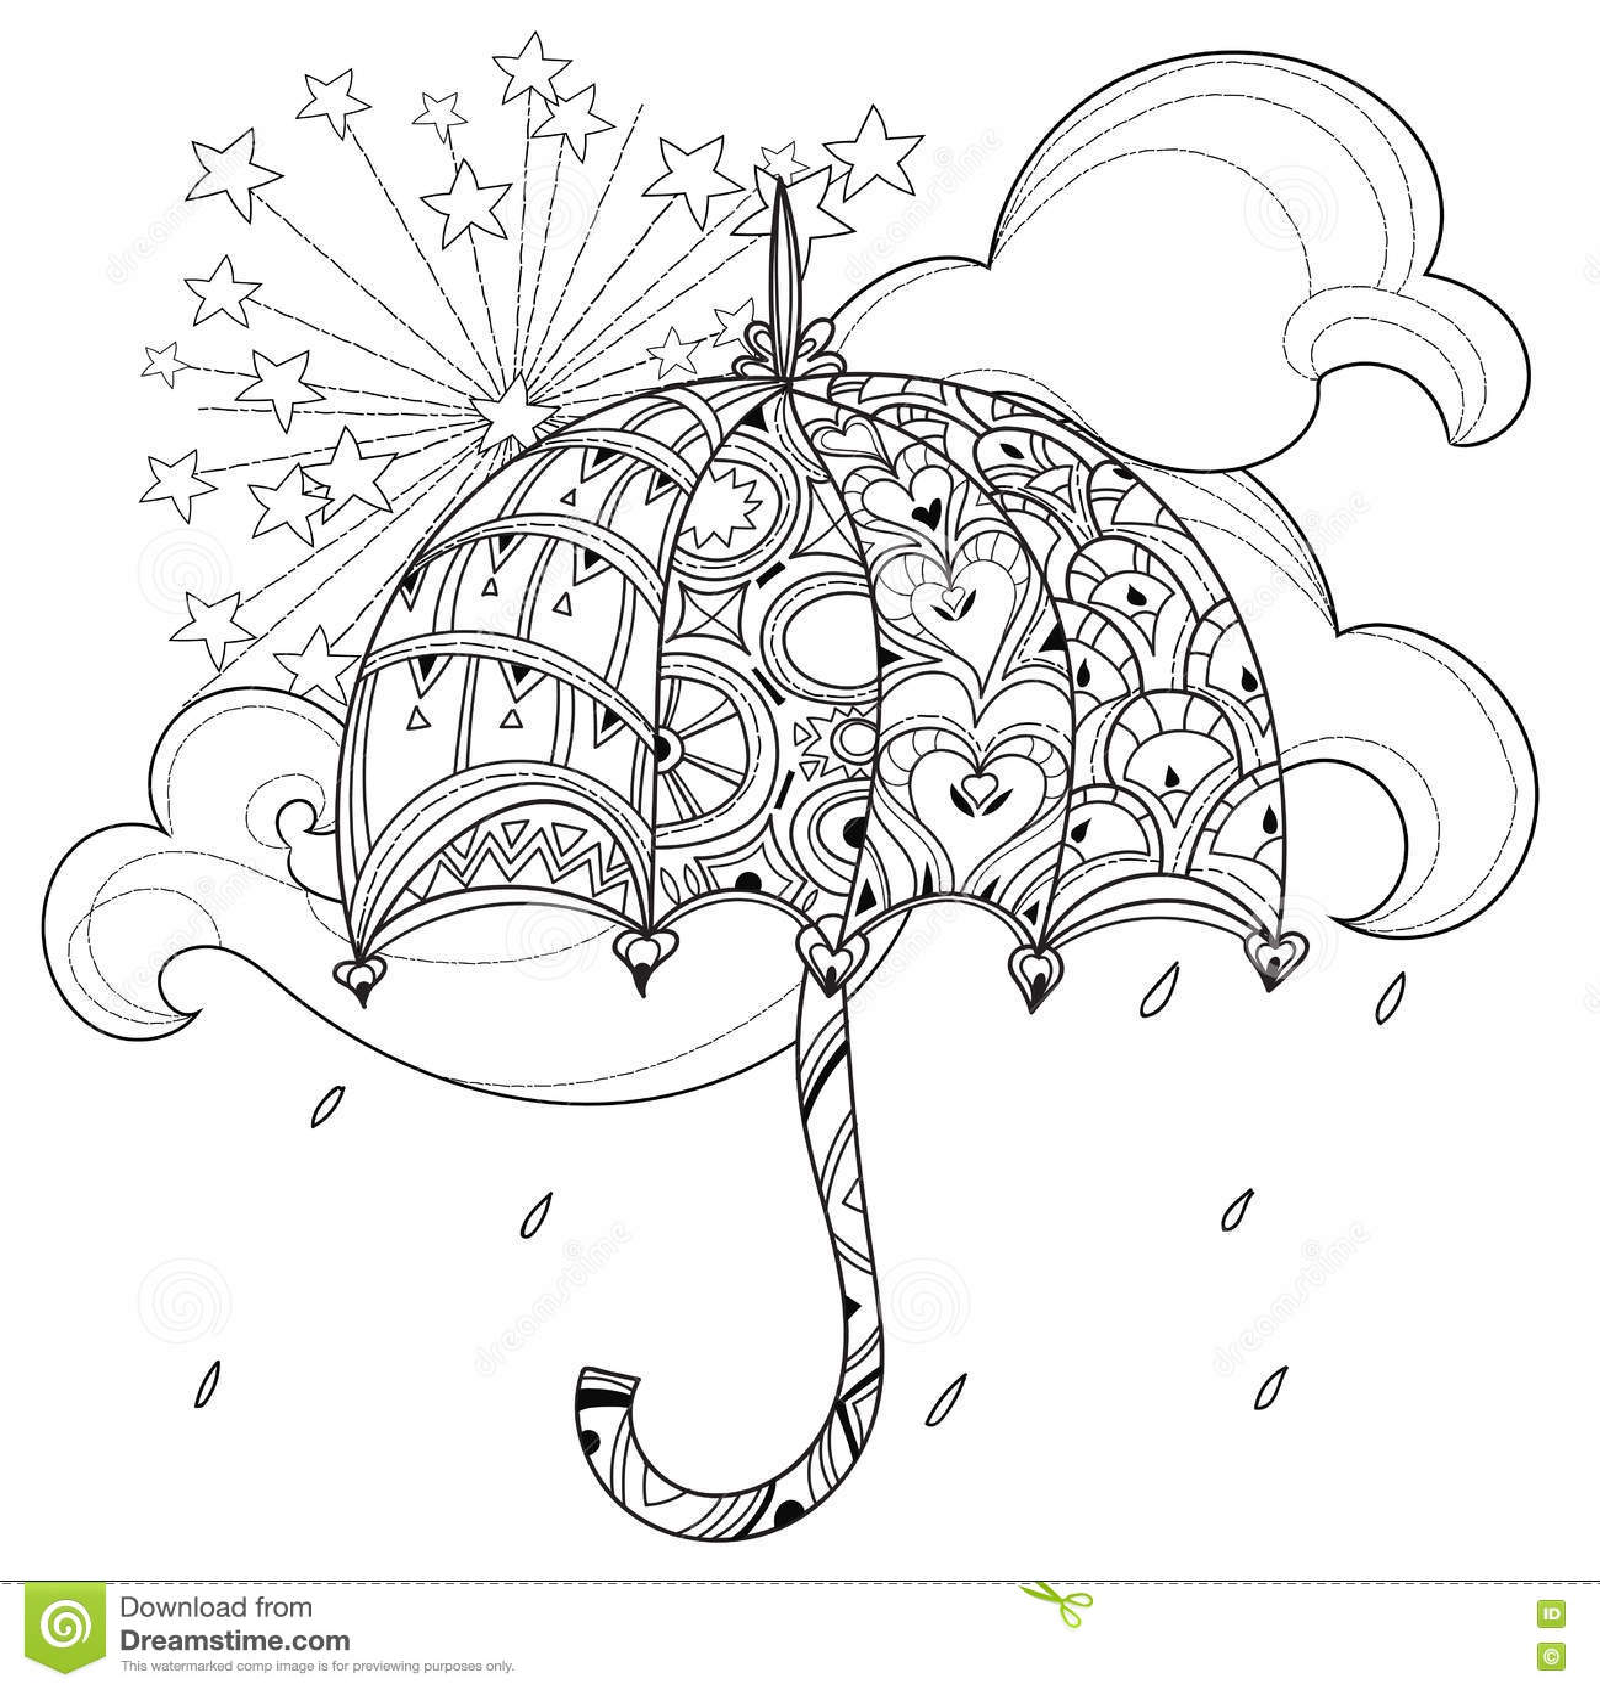 Rainy Tattoos Art: Umbrella On A Rainy Day Doodle Vector Illustration